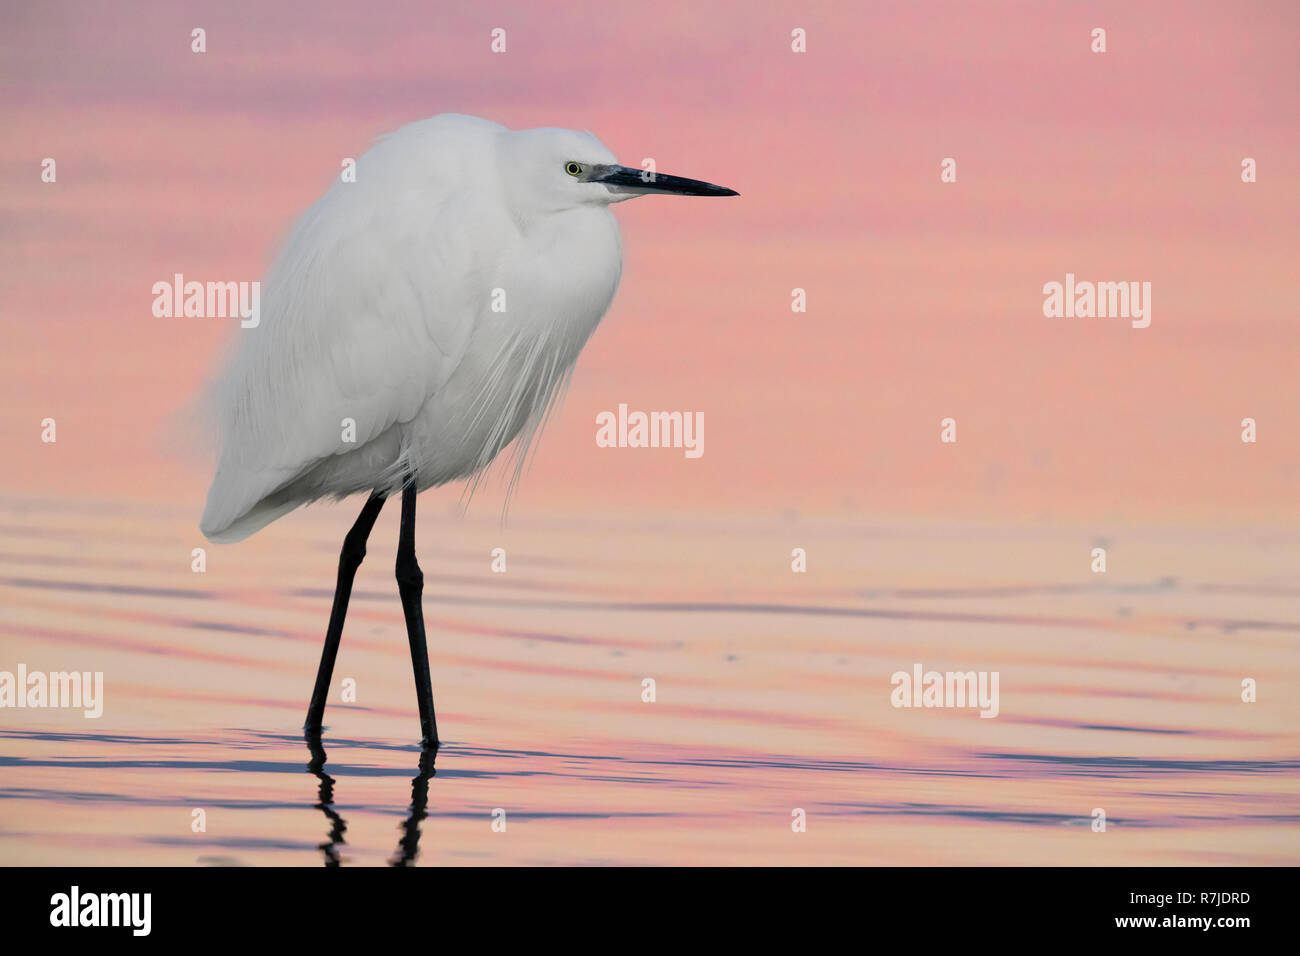 Little Egret (Egretta garzetta), adult in winter plumage standing in the water before the sunrise - Stock Image